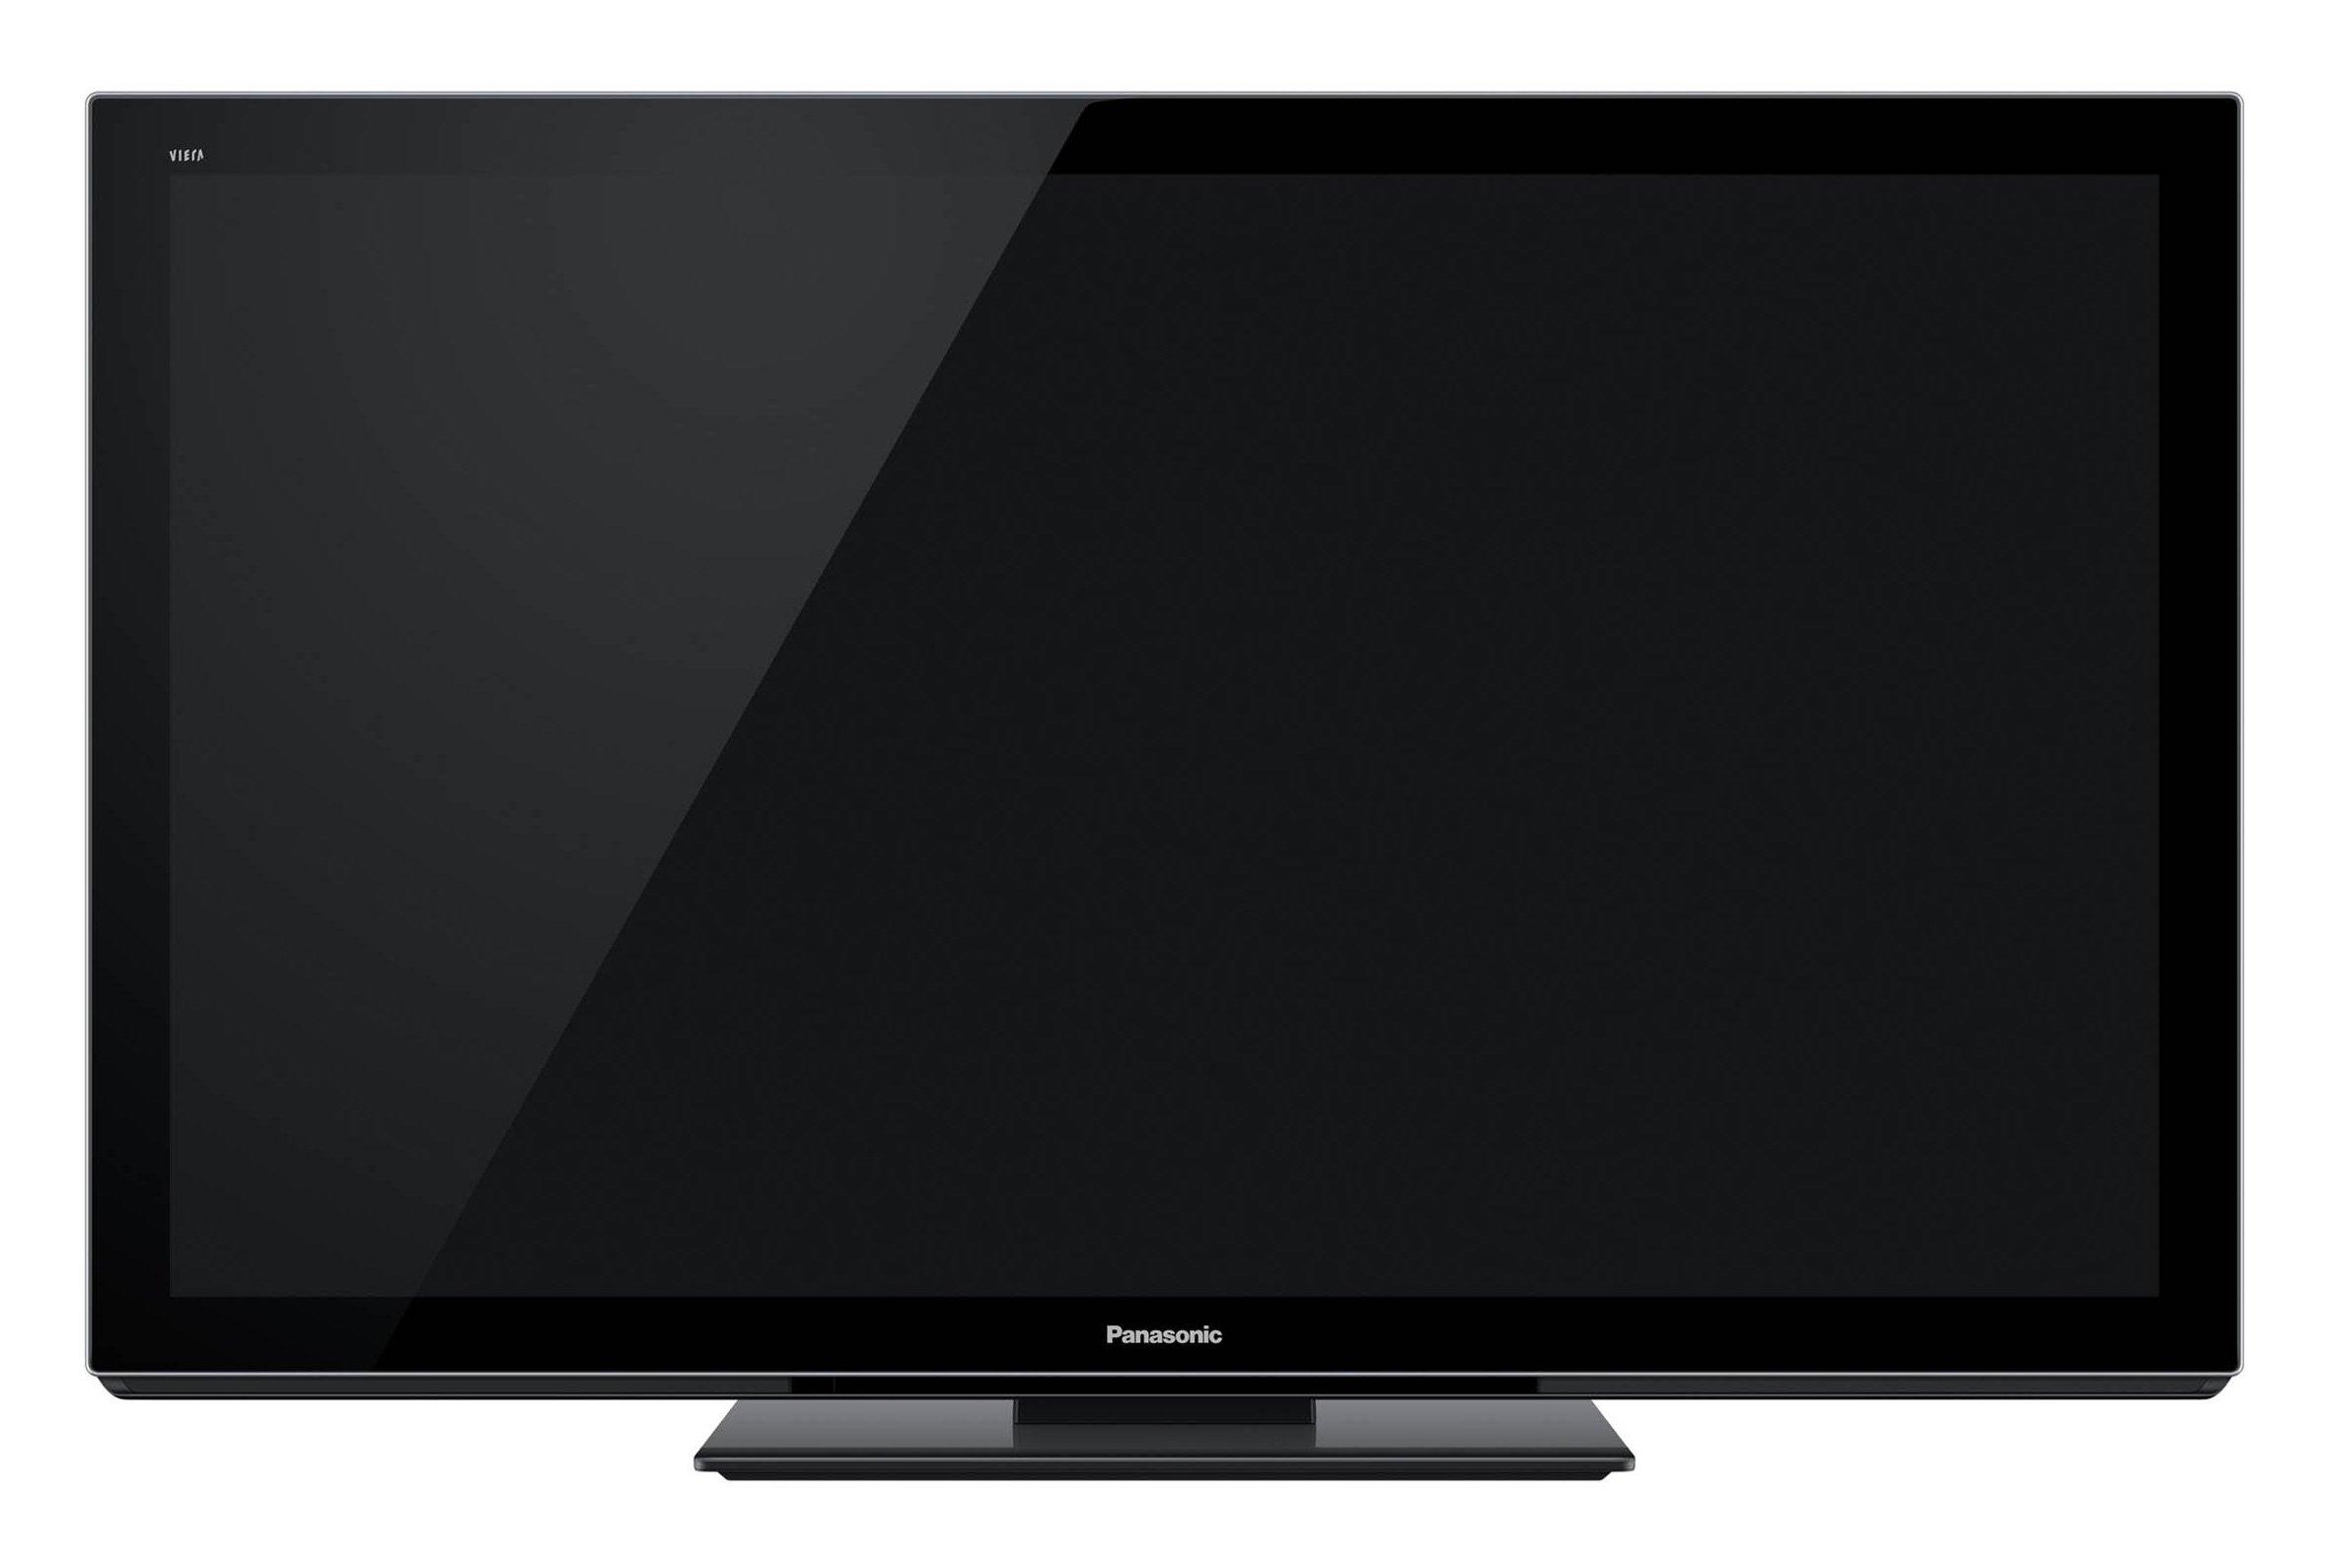 Panasonic Neoplasma 3D 65fHD ultrafino,thx,dlna,us: Amazon.es: Electrónica